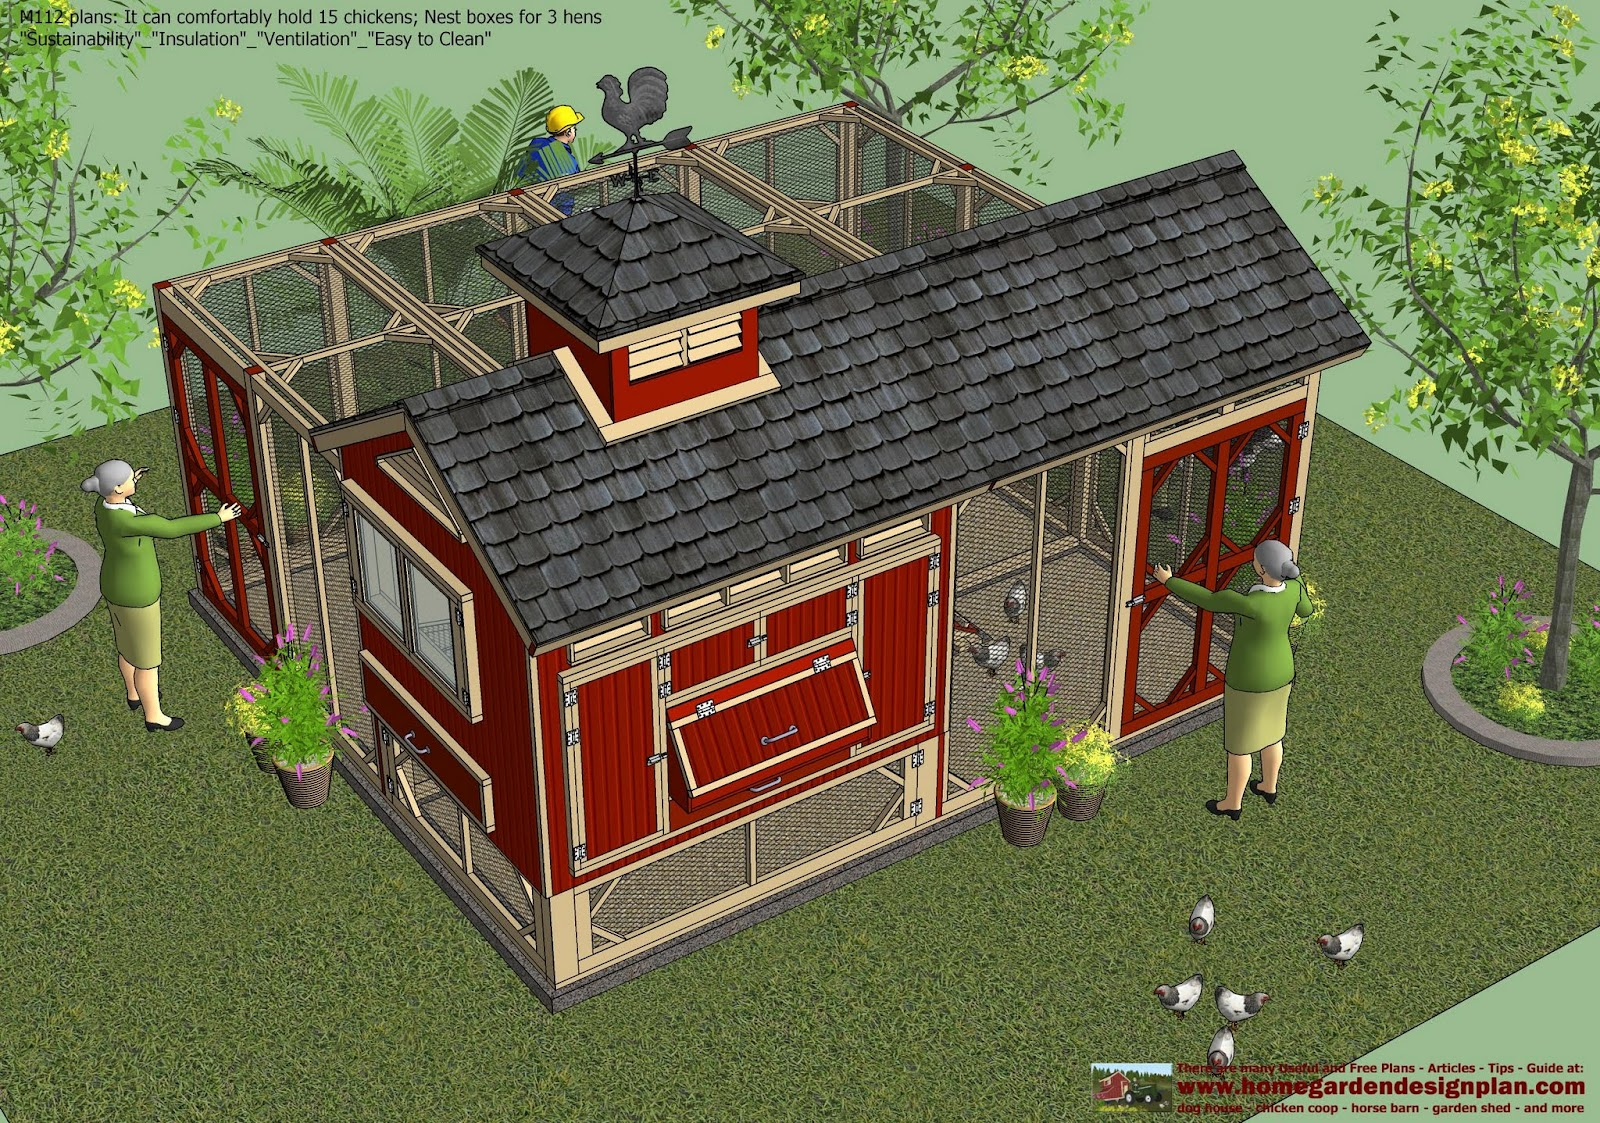 home garden plans: M112